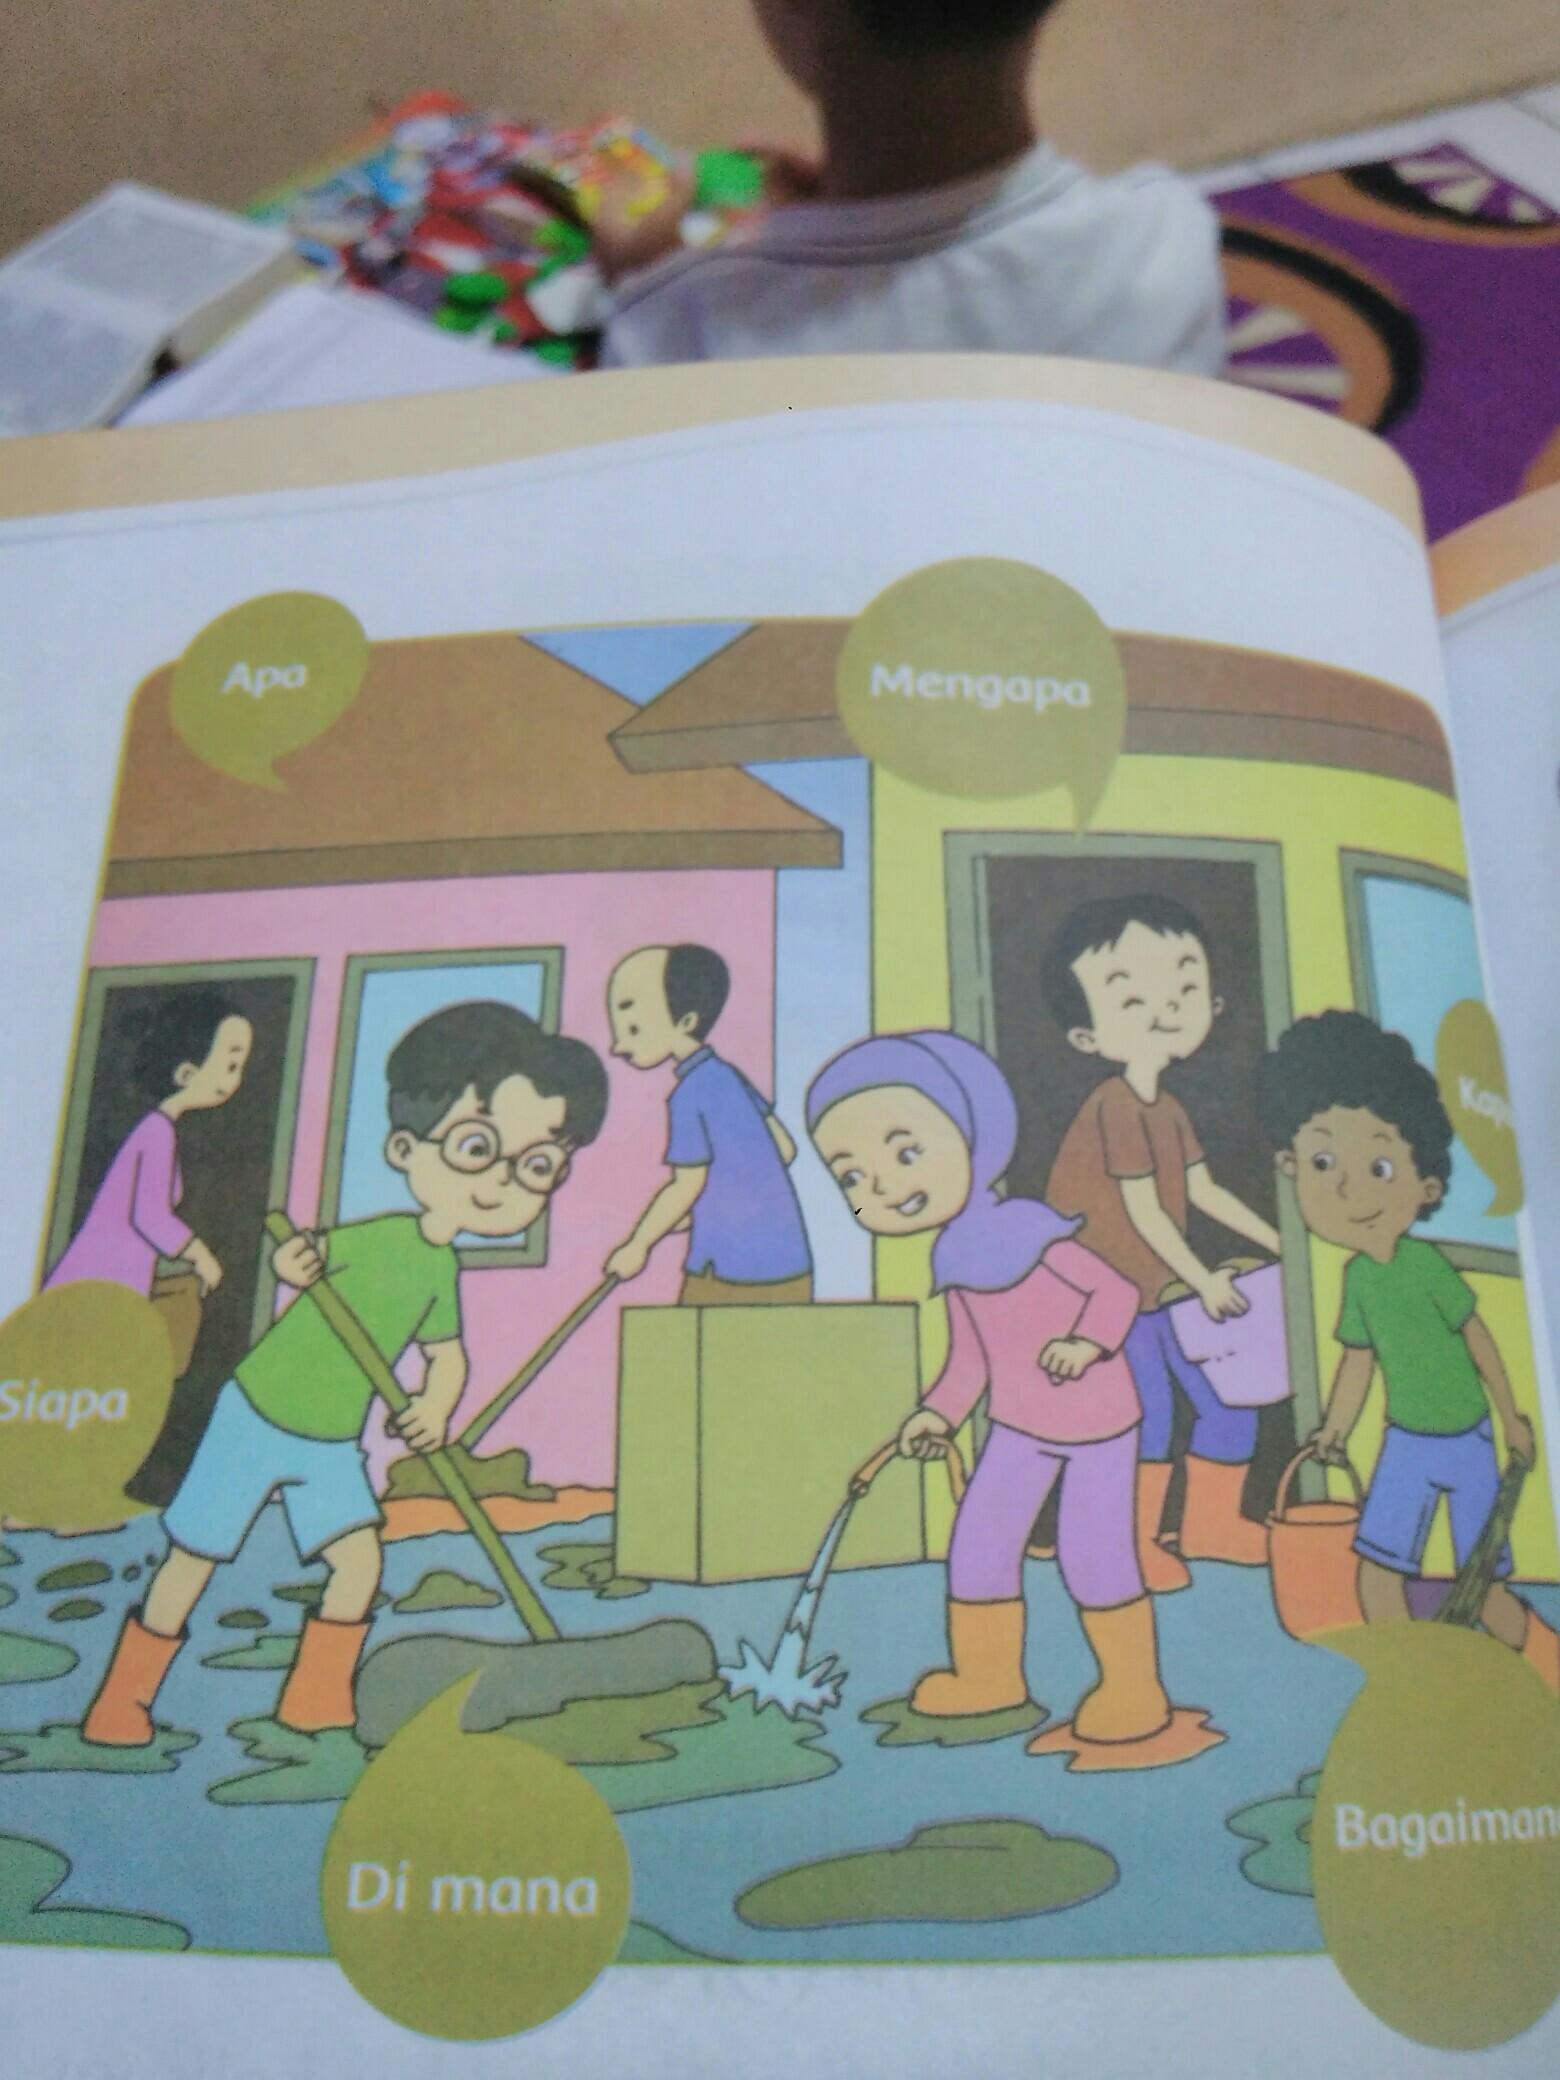 Gambar Kerja Bakti Di Lingkungan Sekolah Kartun Amati Kembali Gambar Udin Dan Teman Teman Kerja Bakti Membantu Korban Banjir Dengan Teliti Ajukan Brainly Co Id